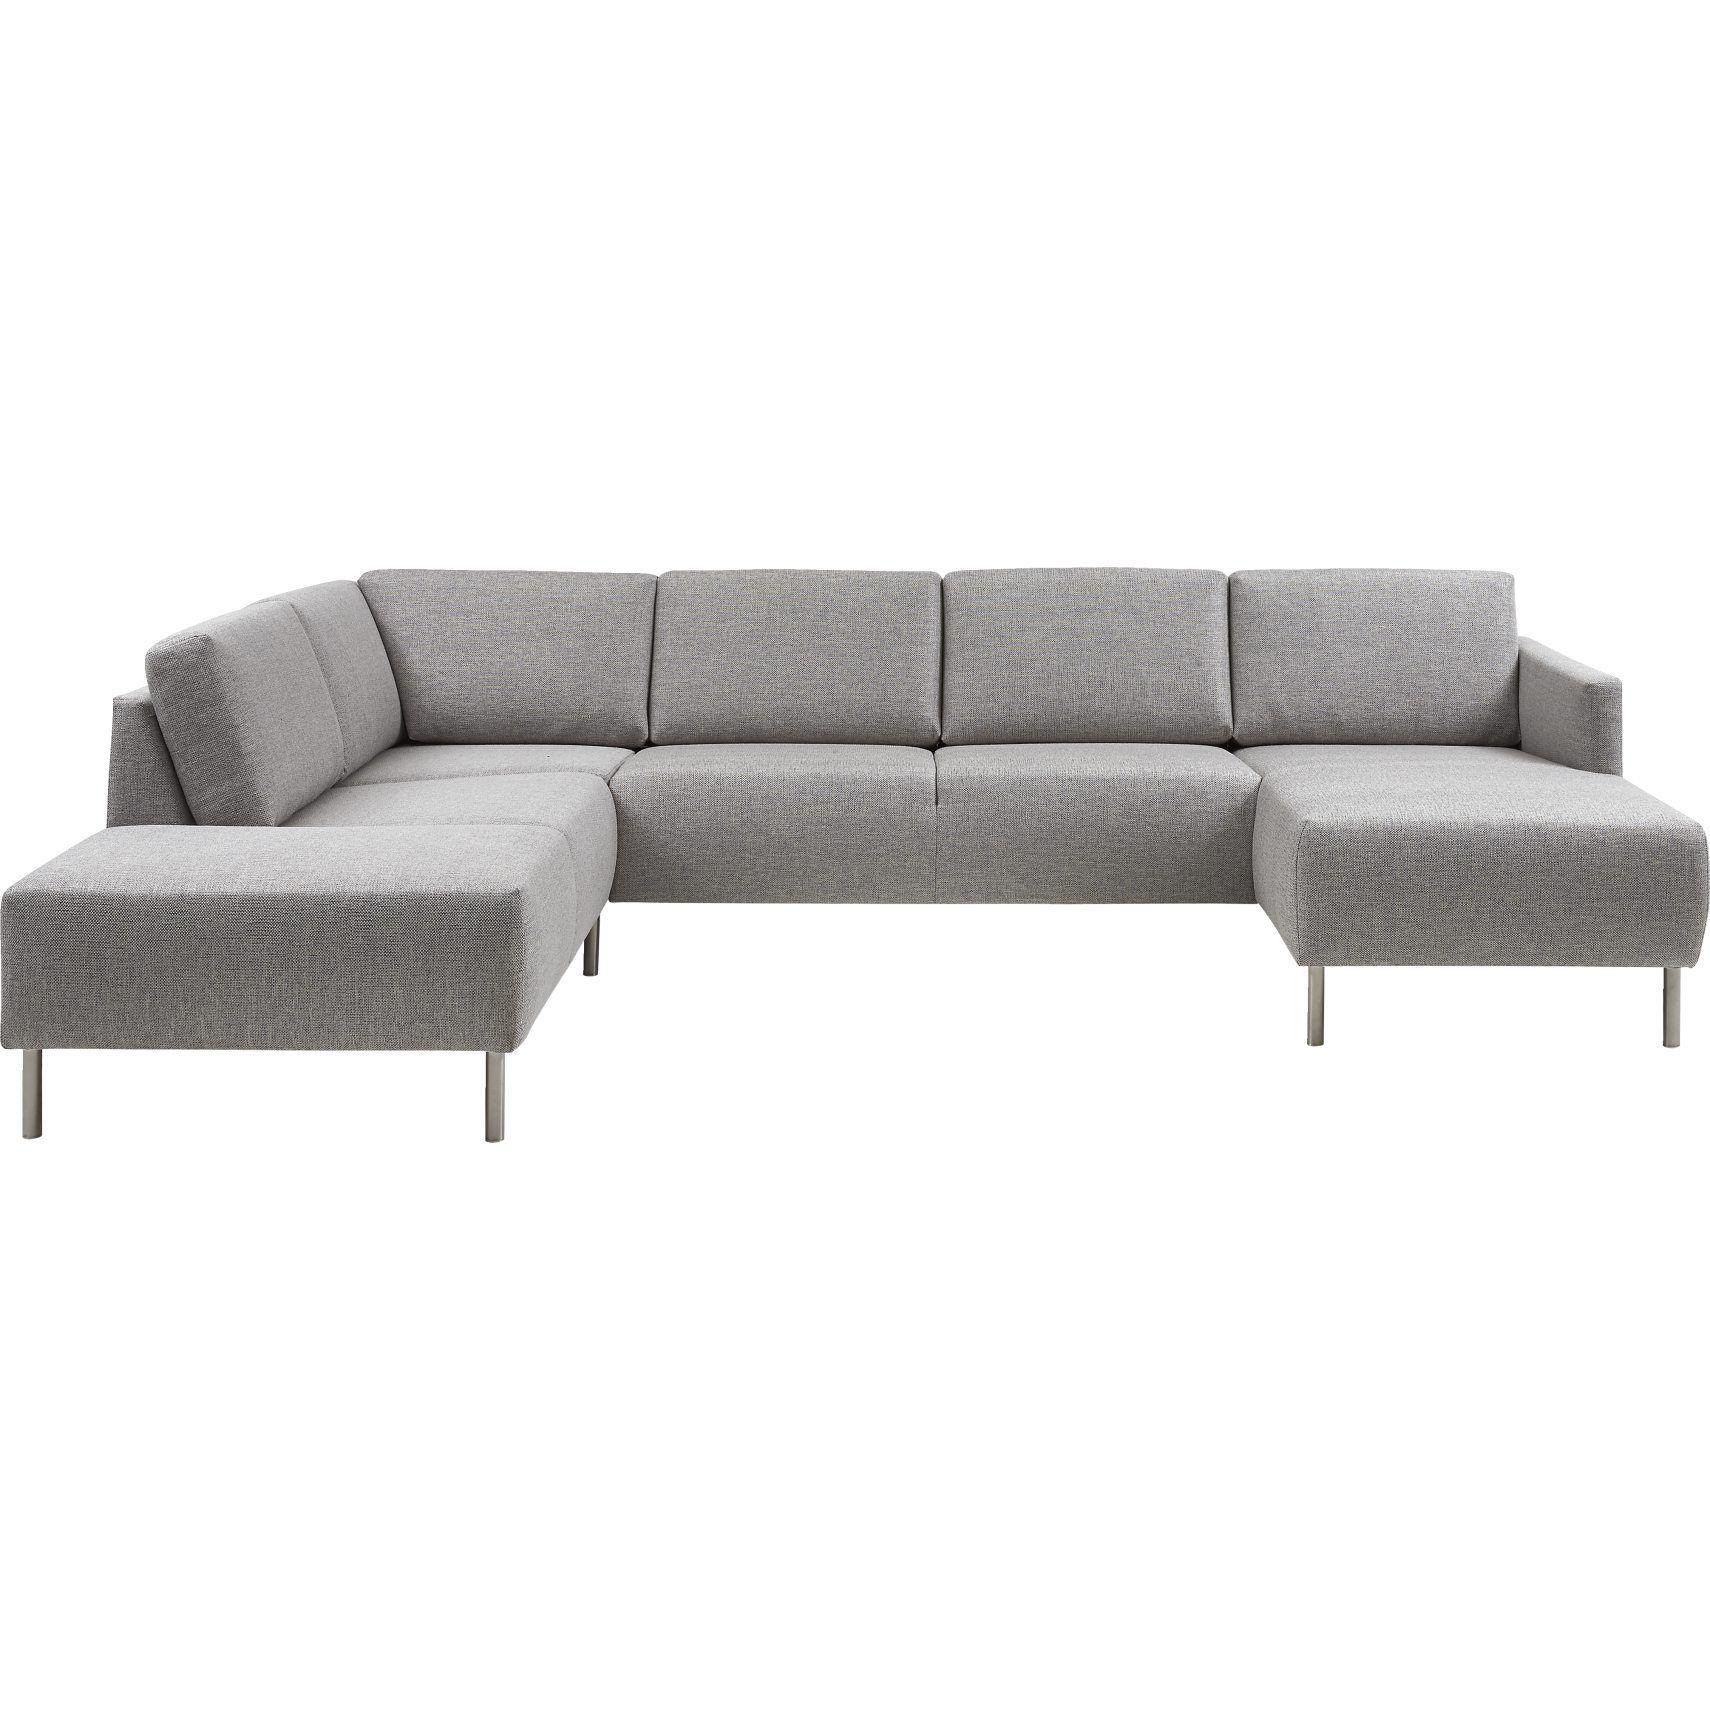 24 Elegante Chaise Lounge Sofa Ikea   Sofa, Spiegelbild